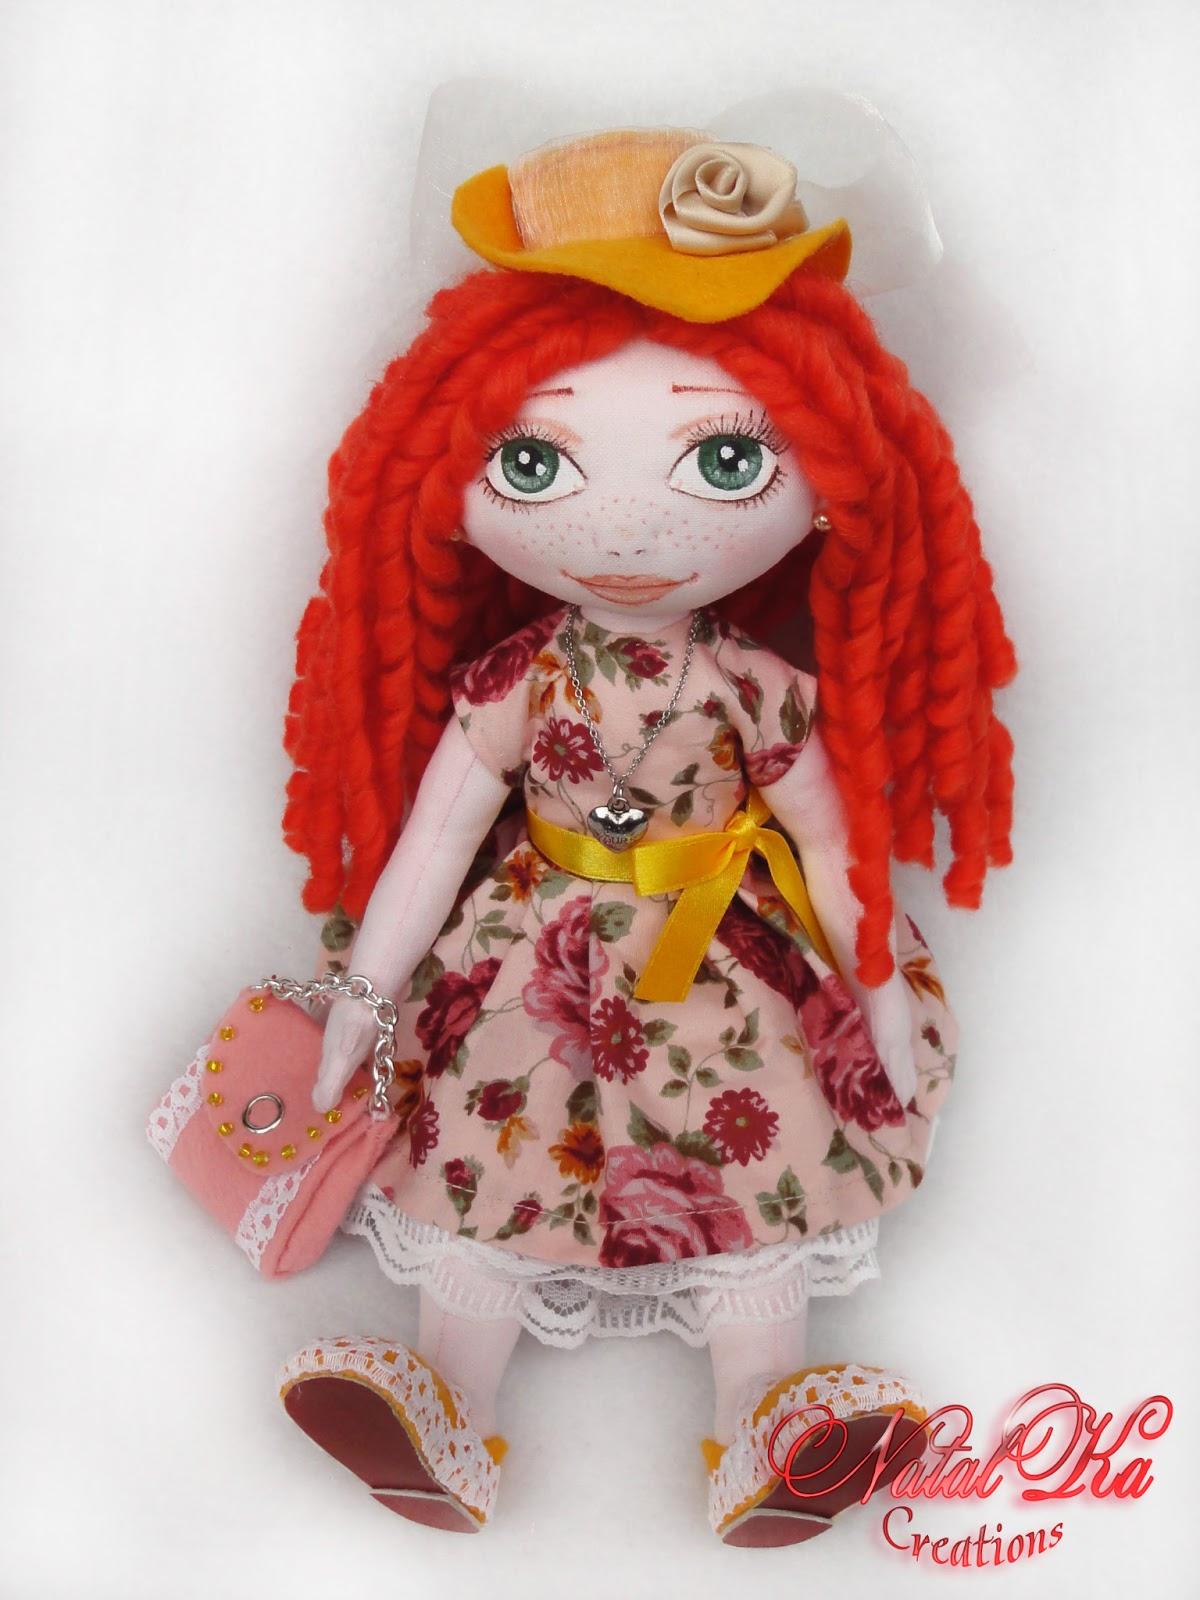 Авторская текстильная кукла от NatalKa Creations. Art doll